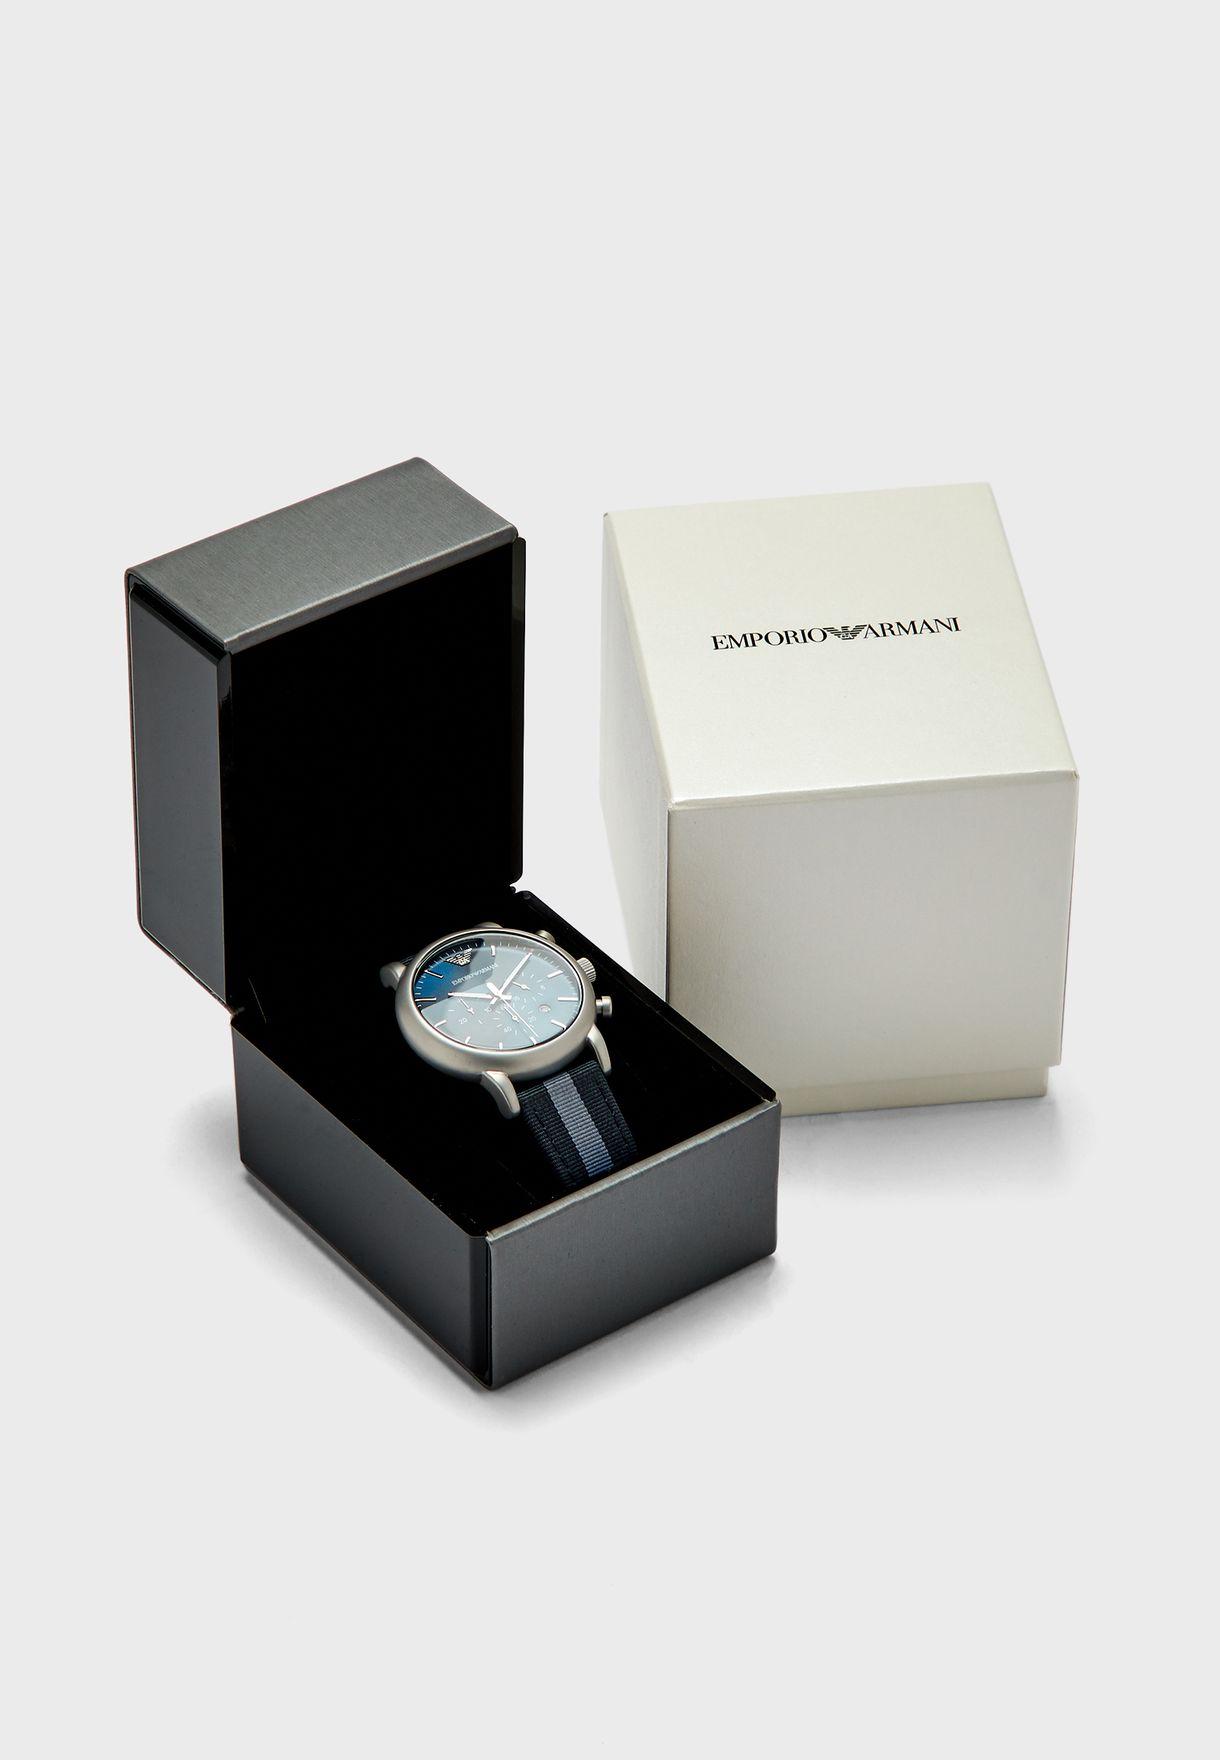 ساعة انالوج بخصائص كرونوغراف